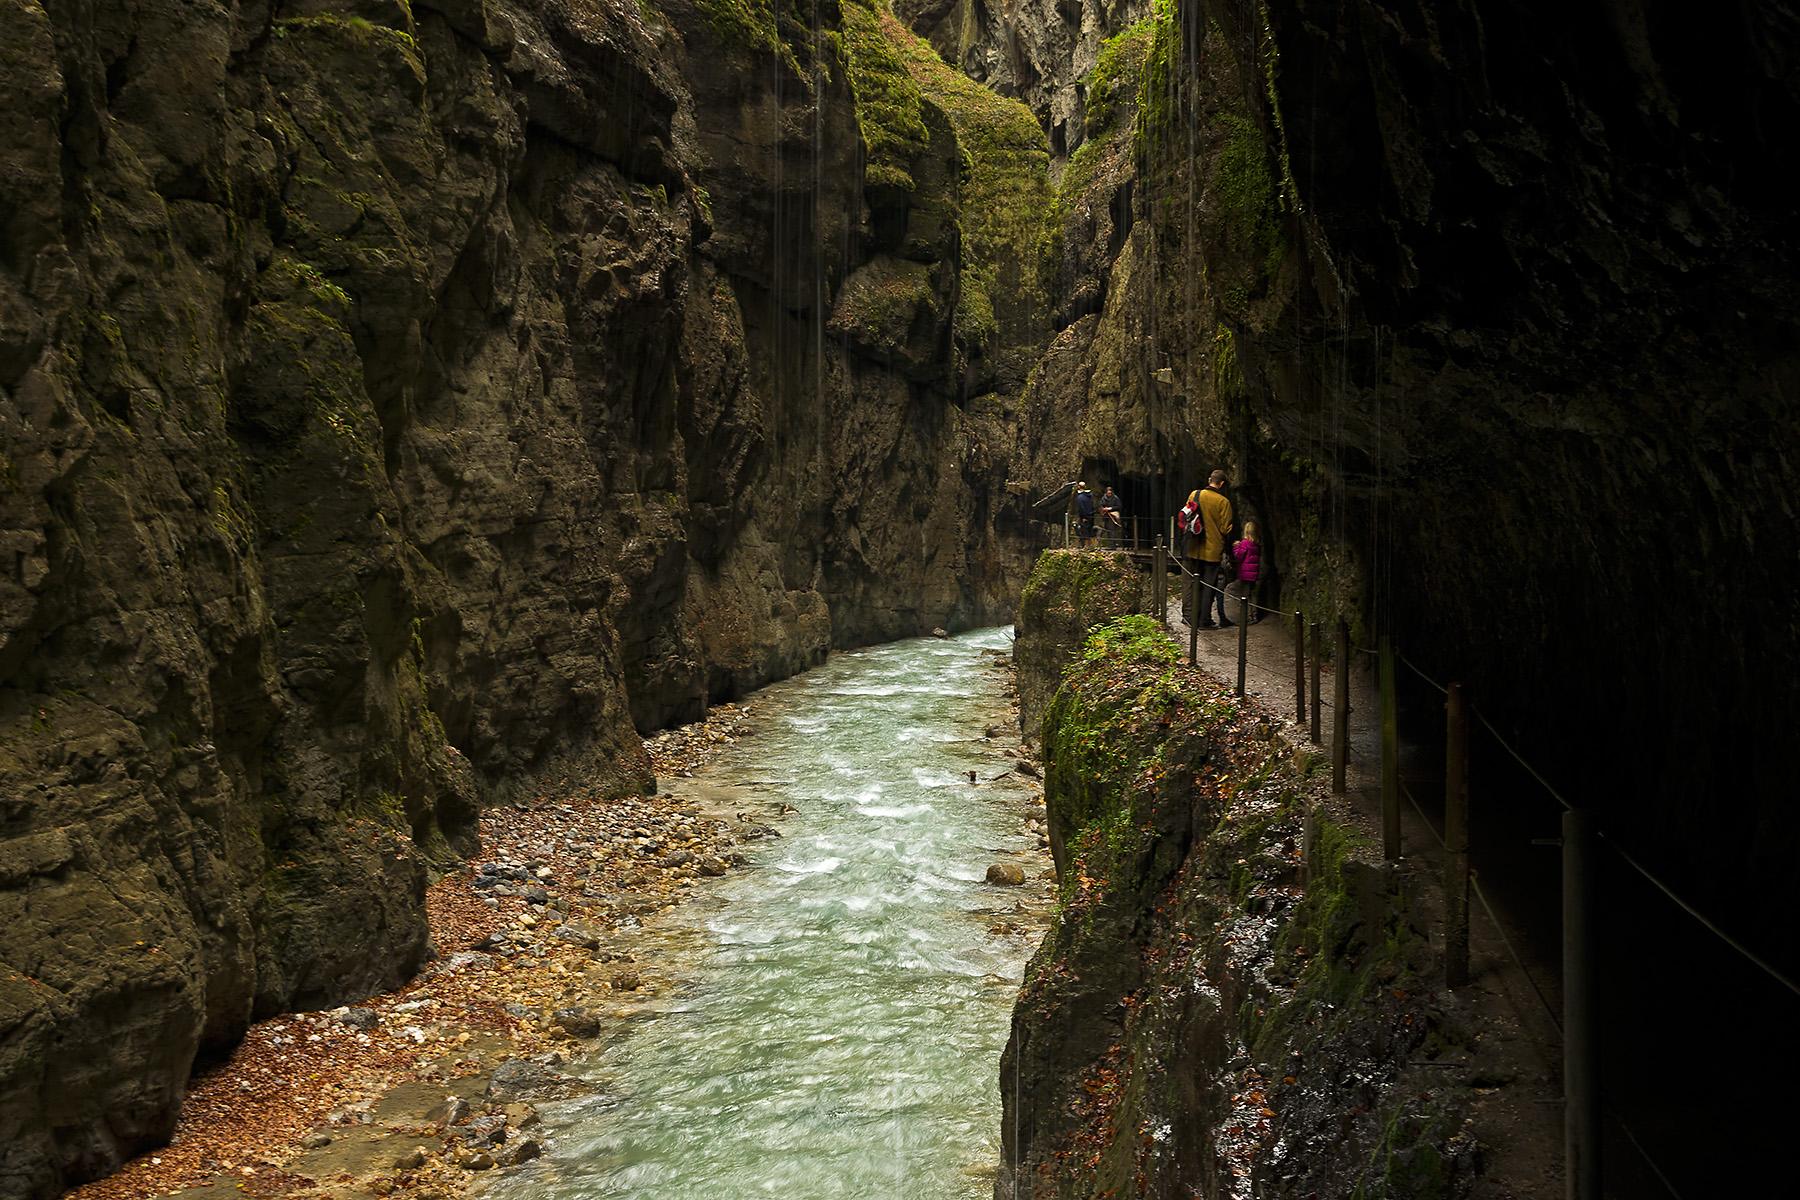 Partnach Gorge, Germany